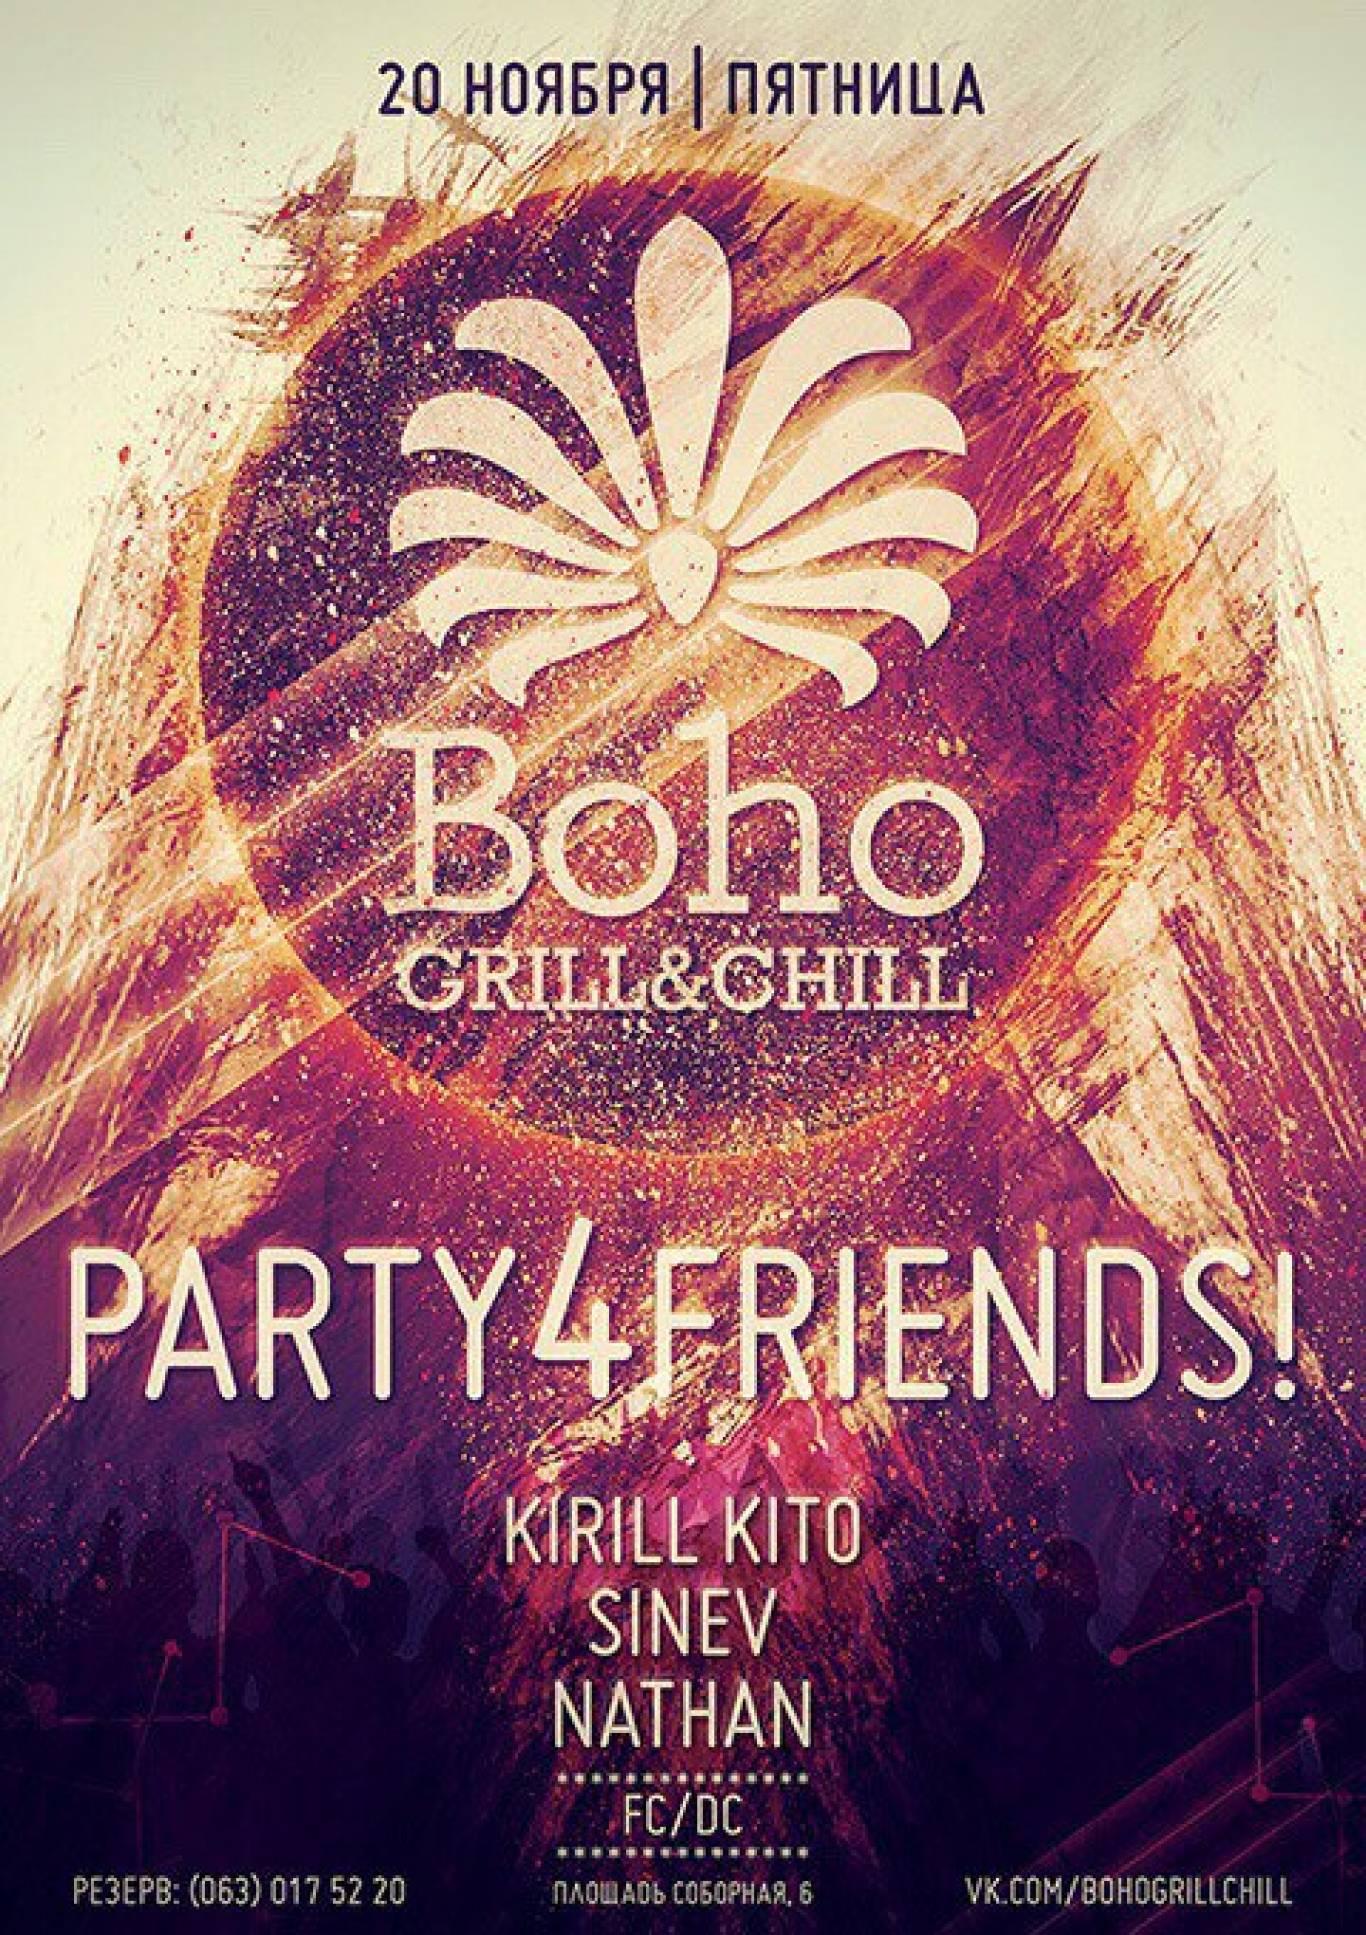 Party 4 Friends | Boho